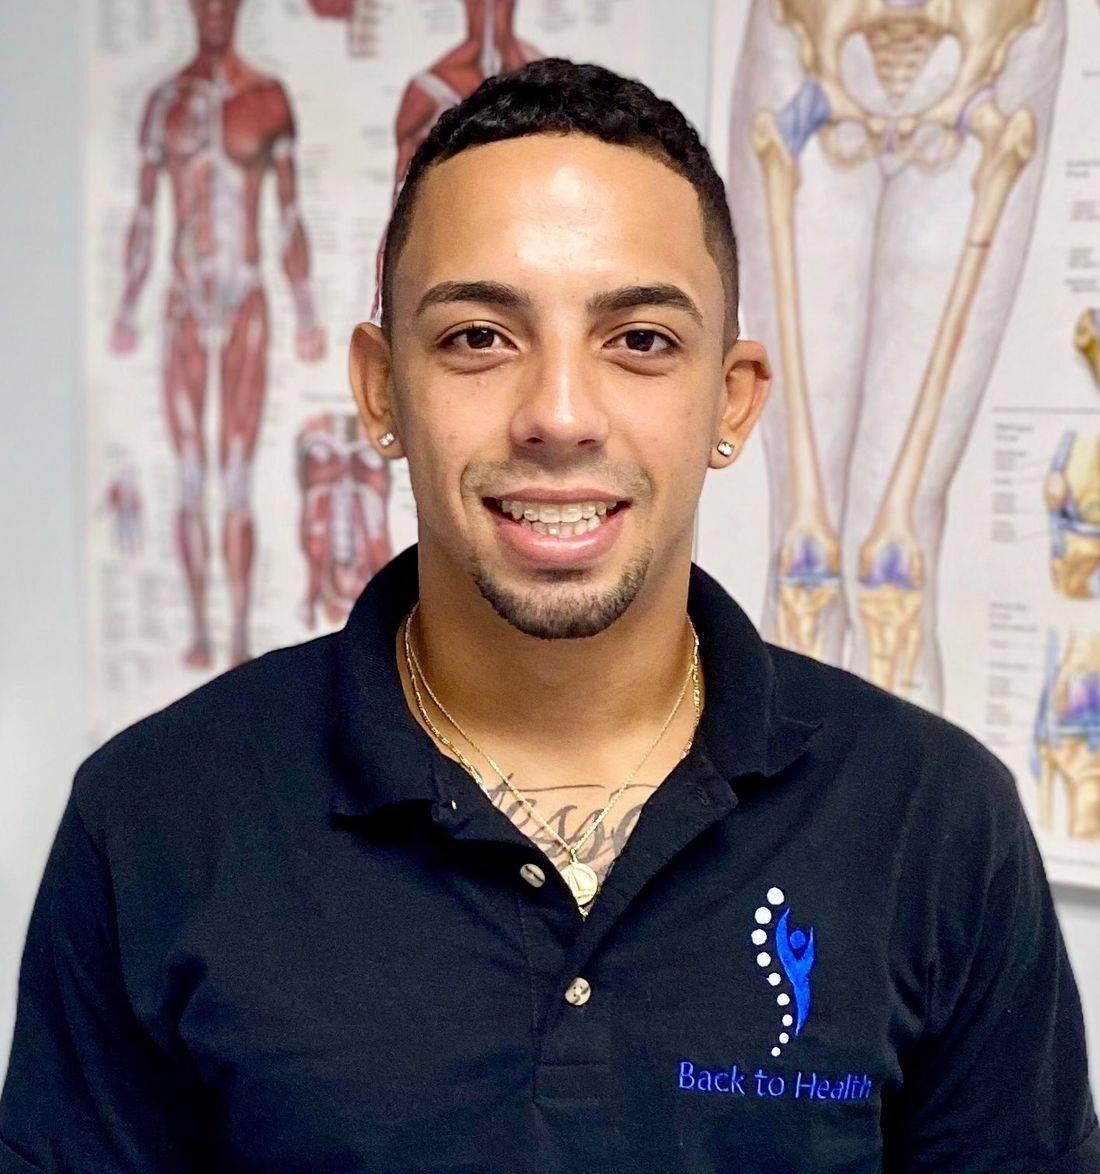 Joseph Pereira, RMT, Massage therapist at Back to Health